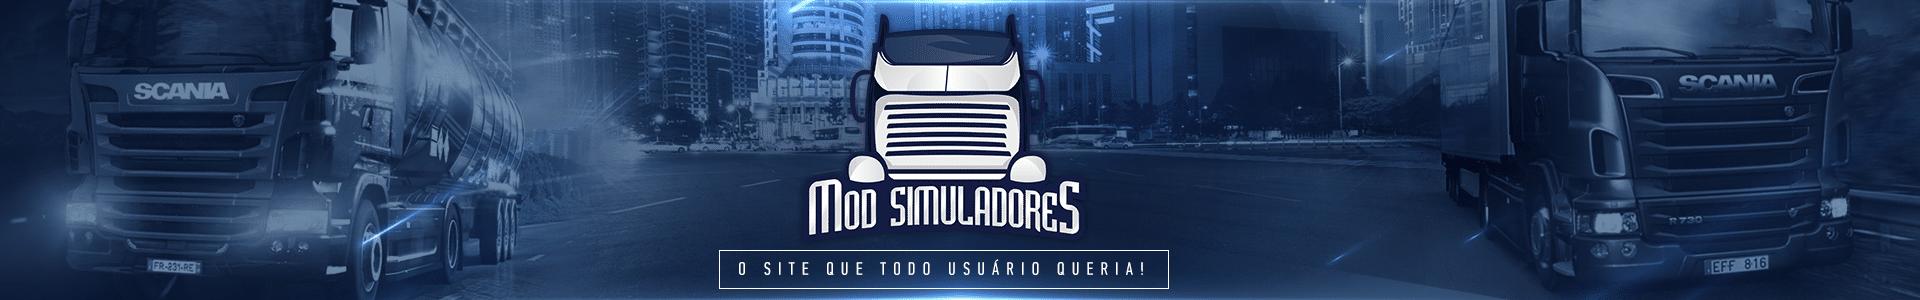 Mod Simuladores ETS2 Mods Euro Truck Simulator